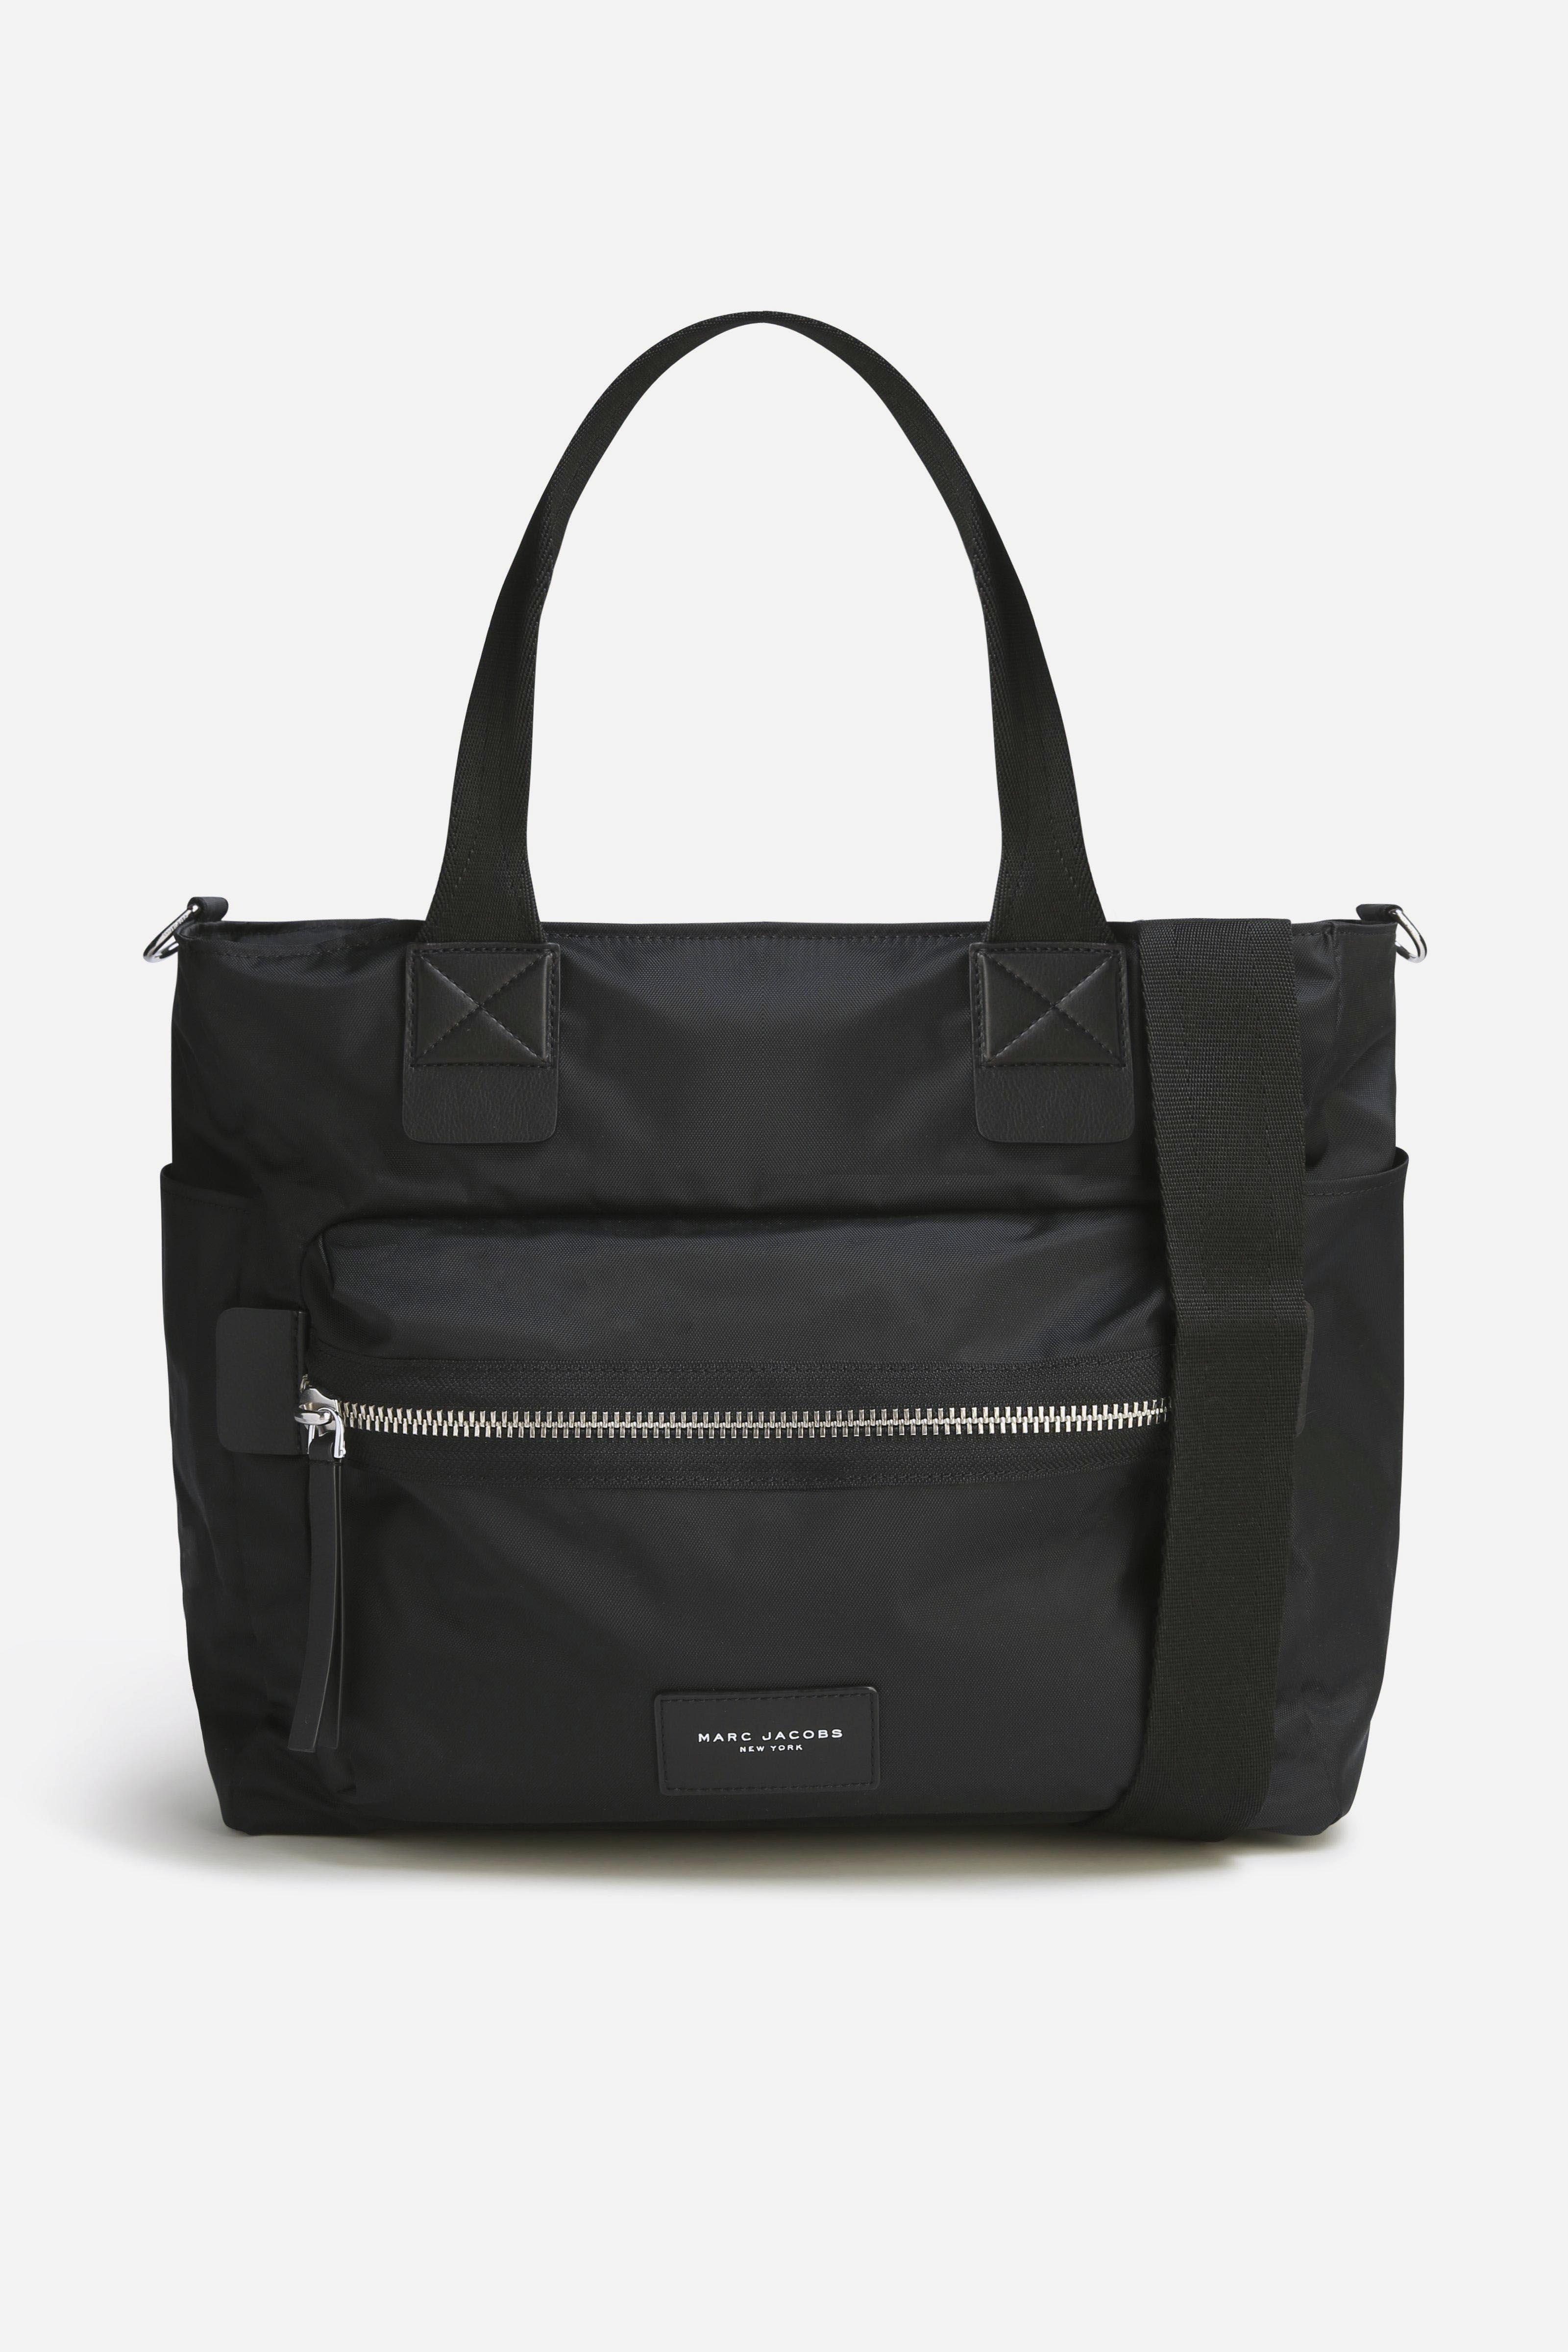 Marc Jacobs 17 - Nylon Biker Baby Bag - Black